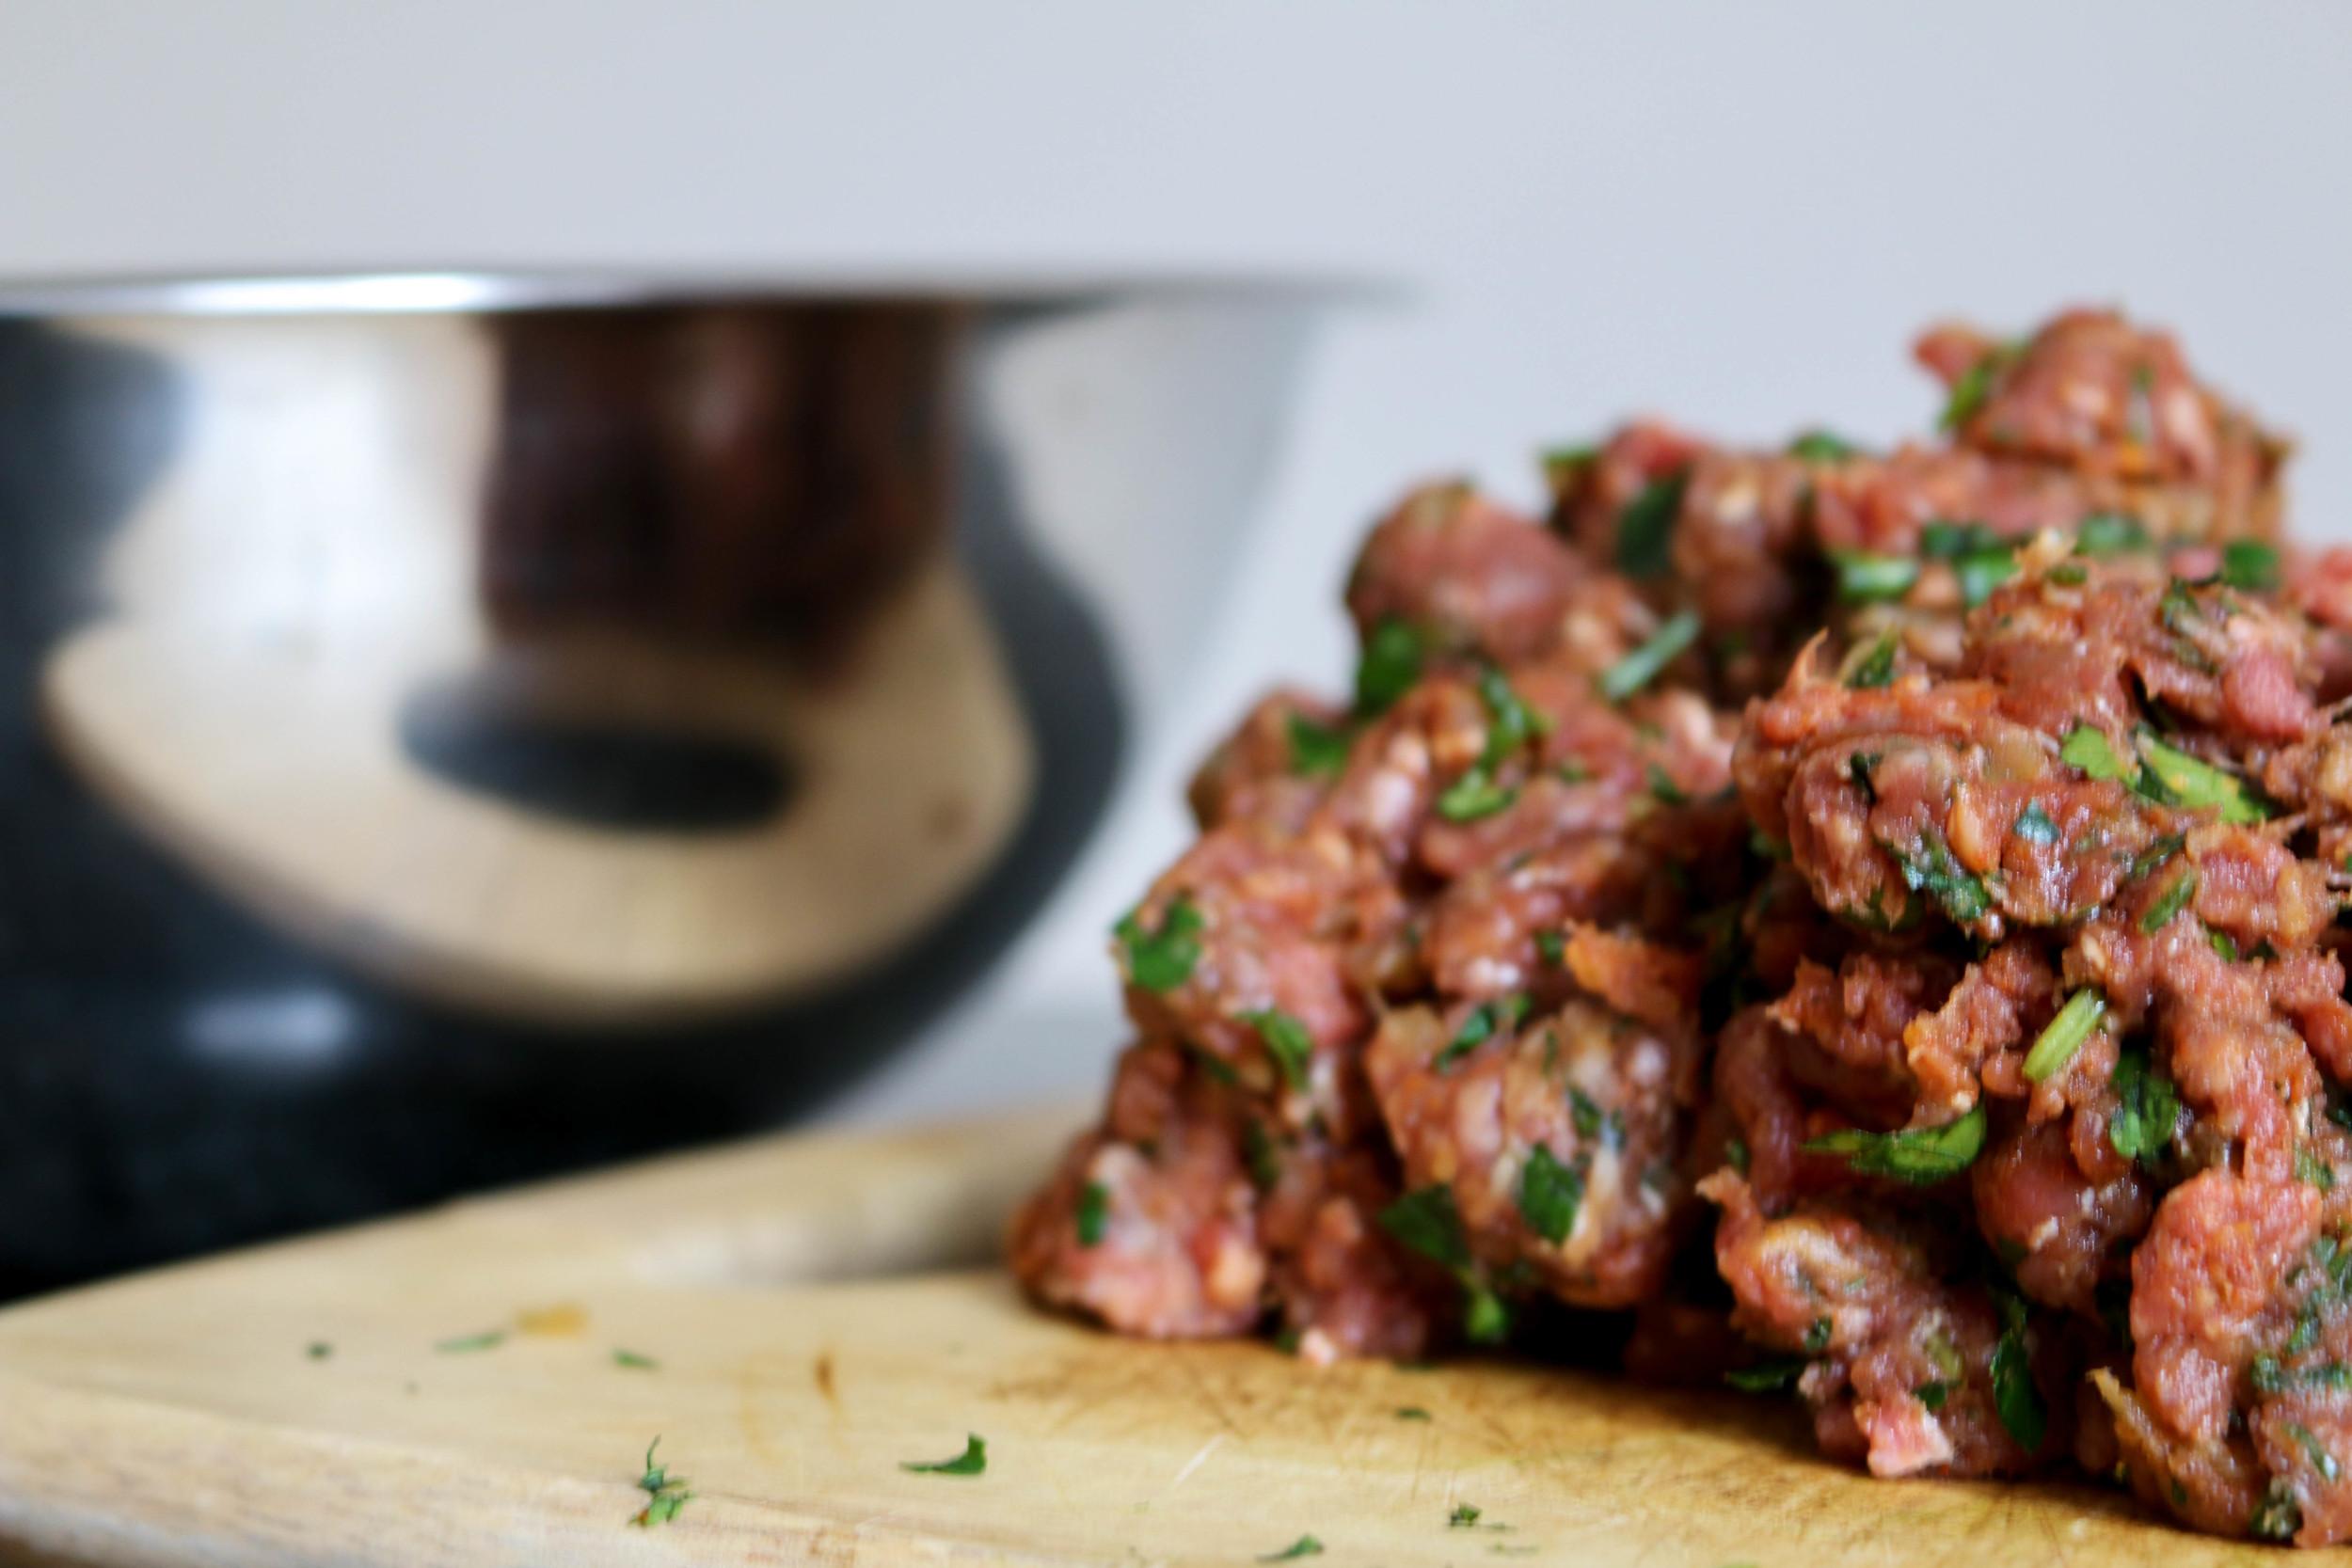 Kefta - Moroccan minced meat